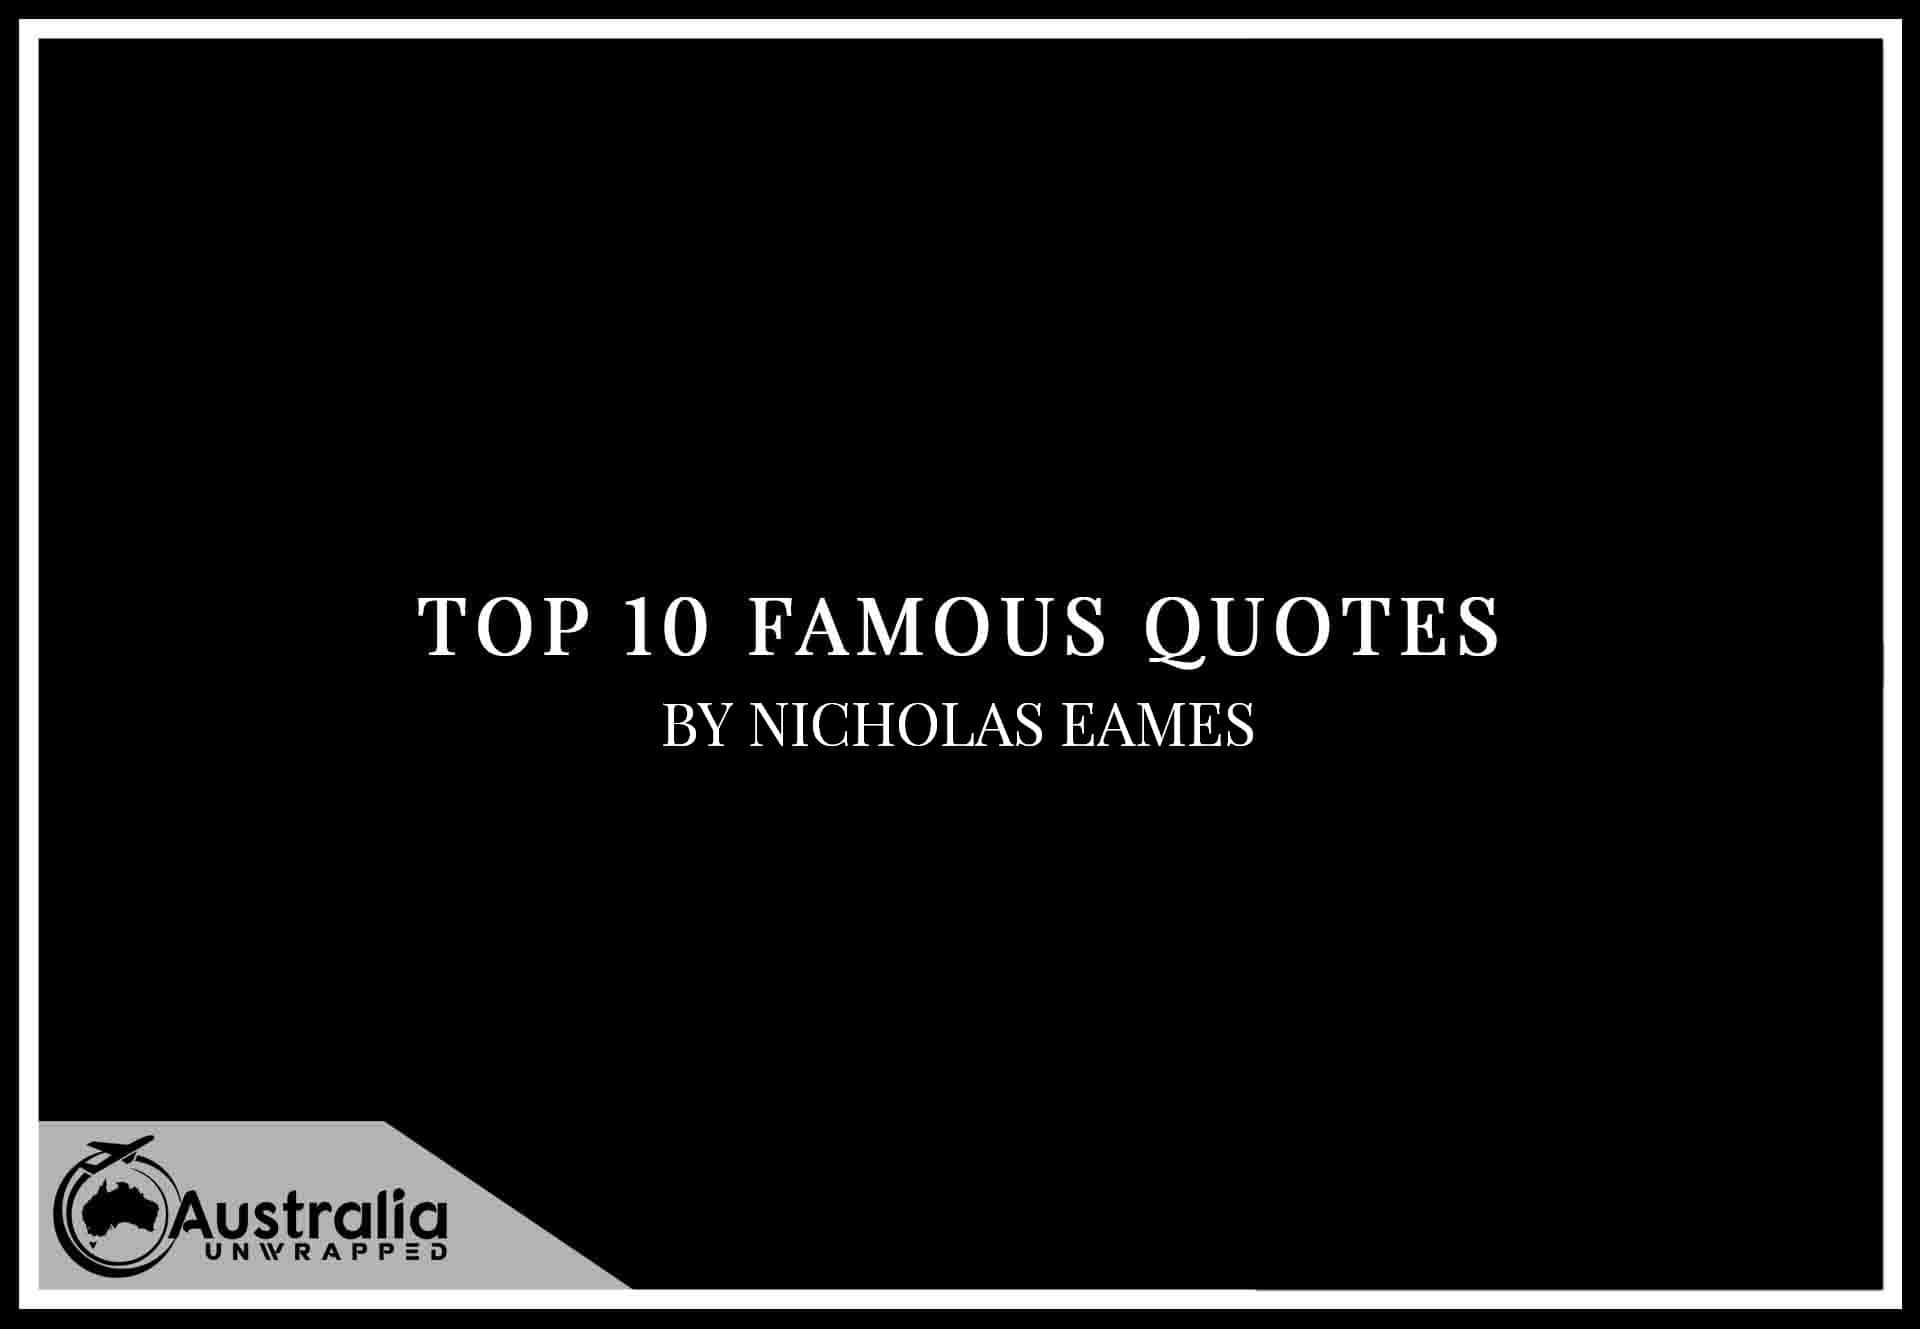 Top 10 Famous Quotes by Author Nicholas Eames